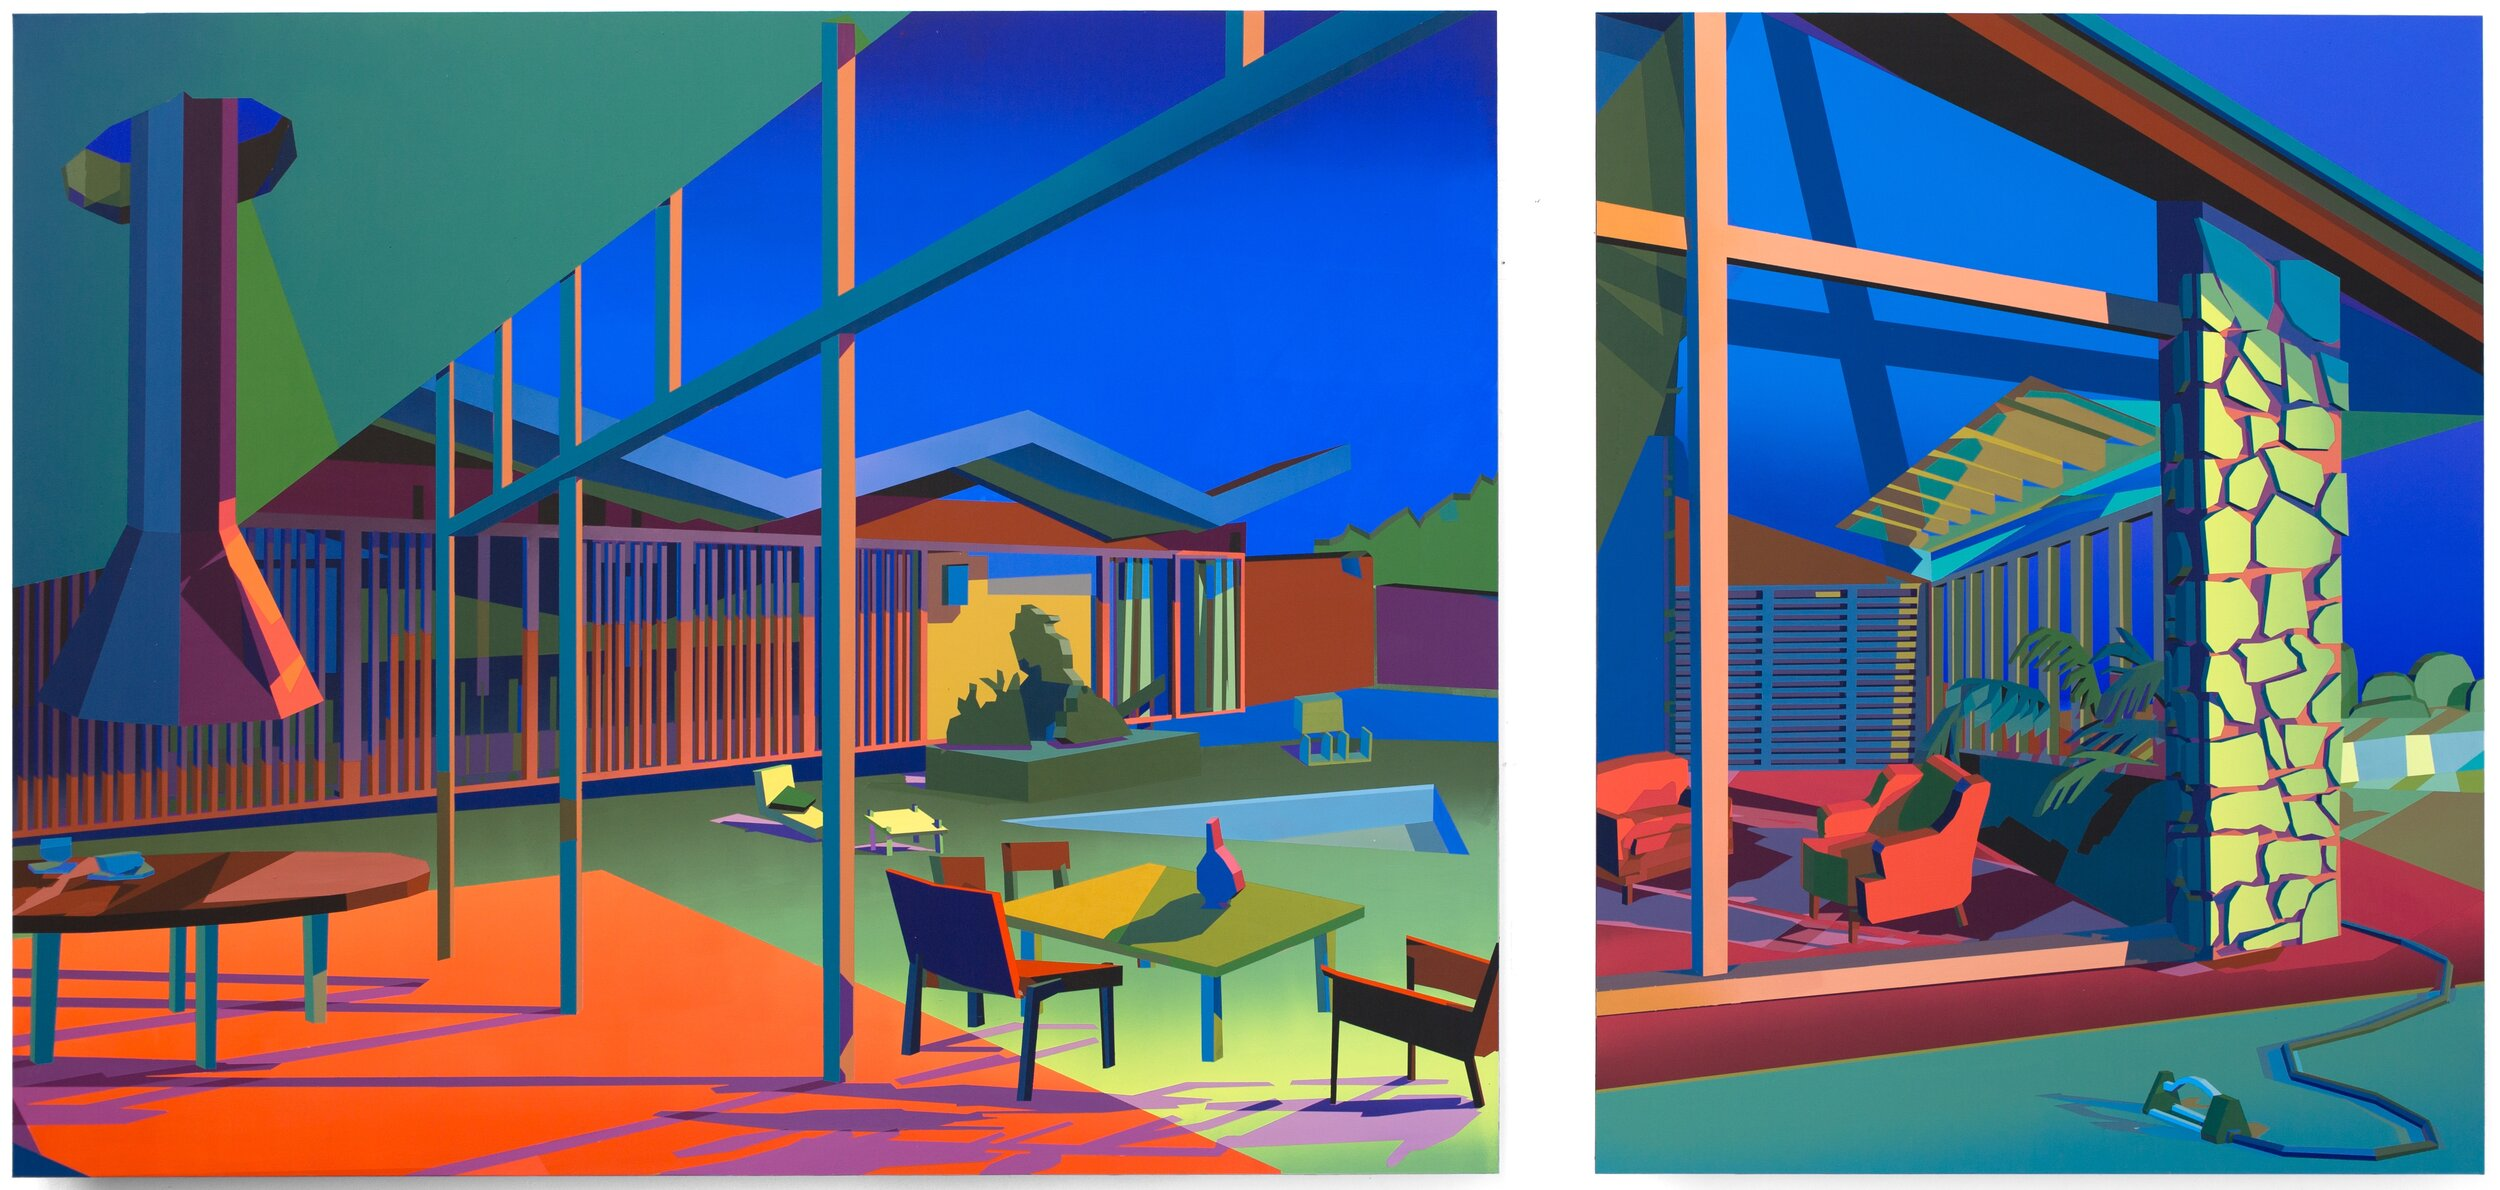 Jonathan Chapline,  Pool House (Dyptich),  2019. Acrylic, flashe on panel, 119 x 152 cm and 89 x 122 cm. Courtesy of The Hole (New York)